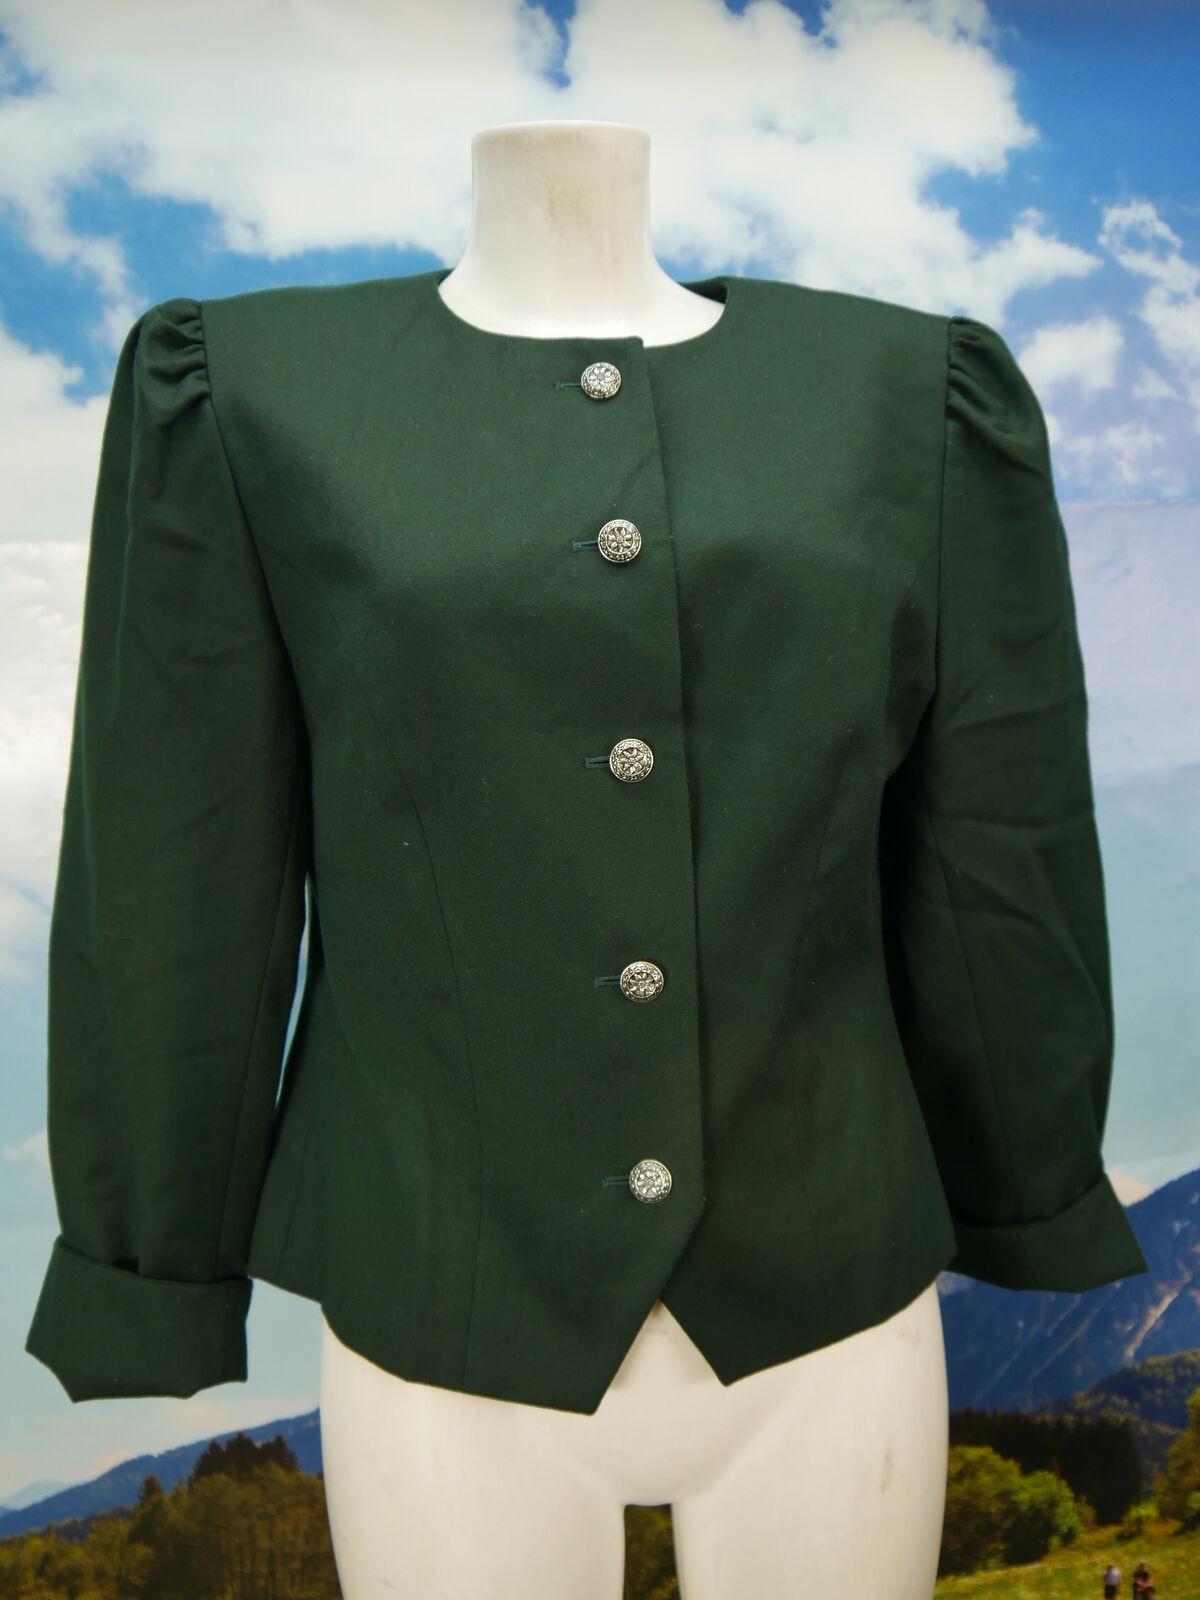 Petressa Janker neuwertig und kurz grün tailliert Trachtenjacke Jacke Gr.40